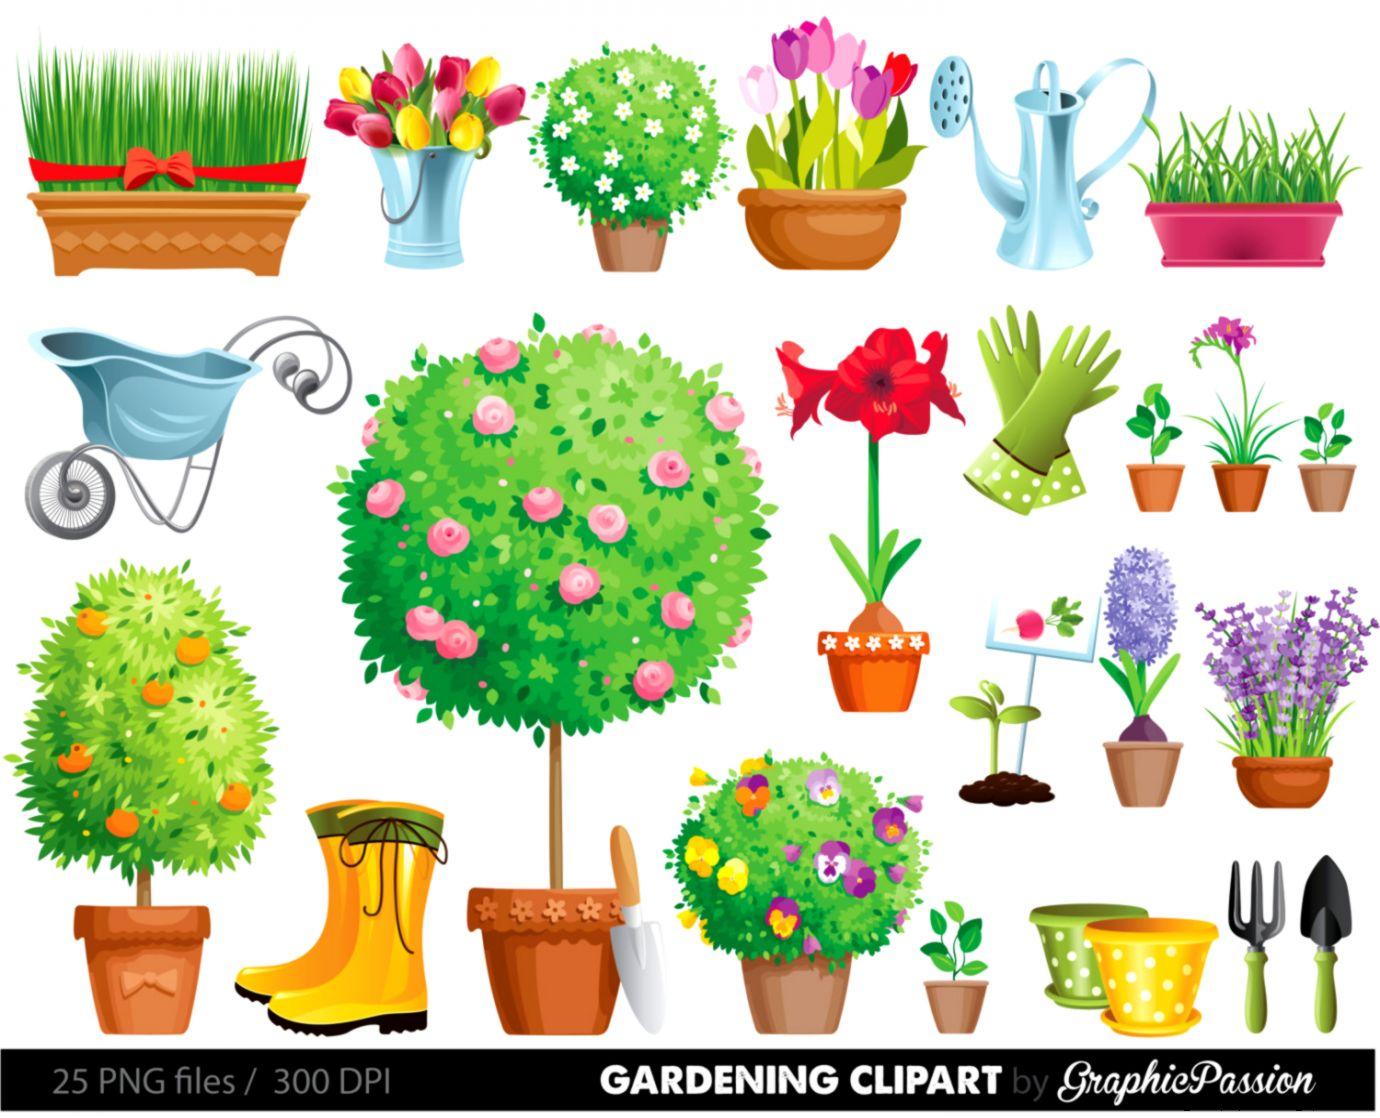 Garden Clipart Gardening Clipart garden tool by GraphicPassion